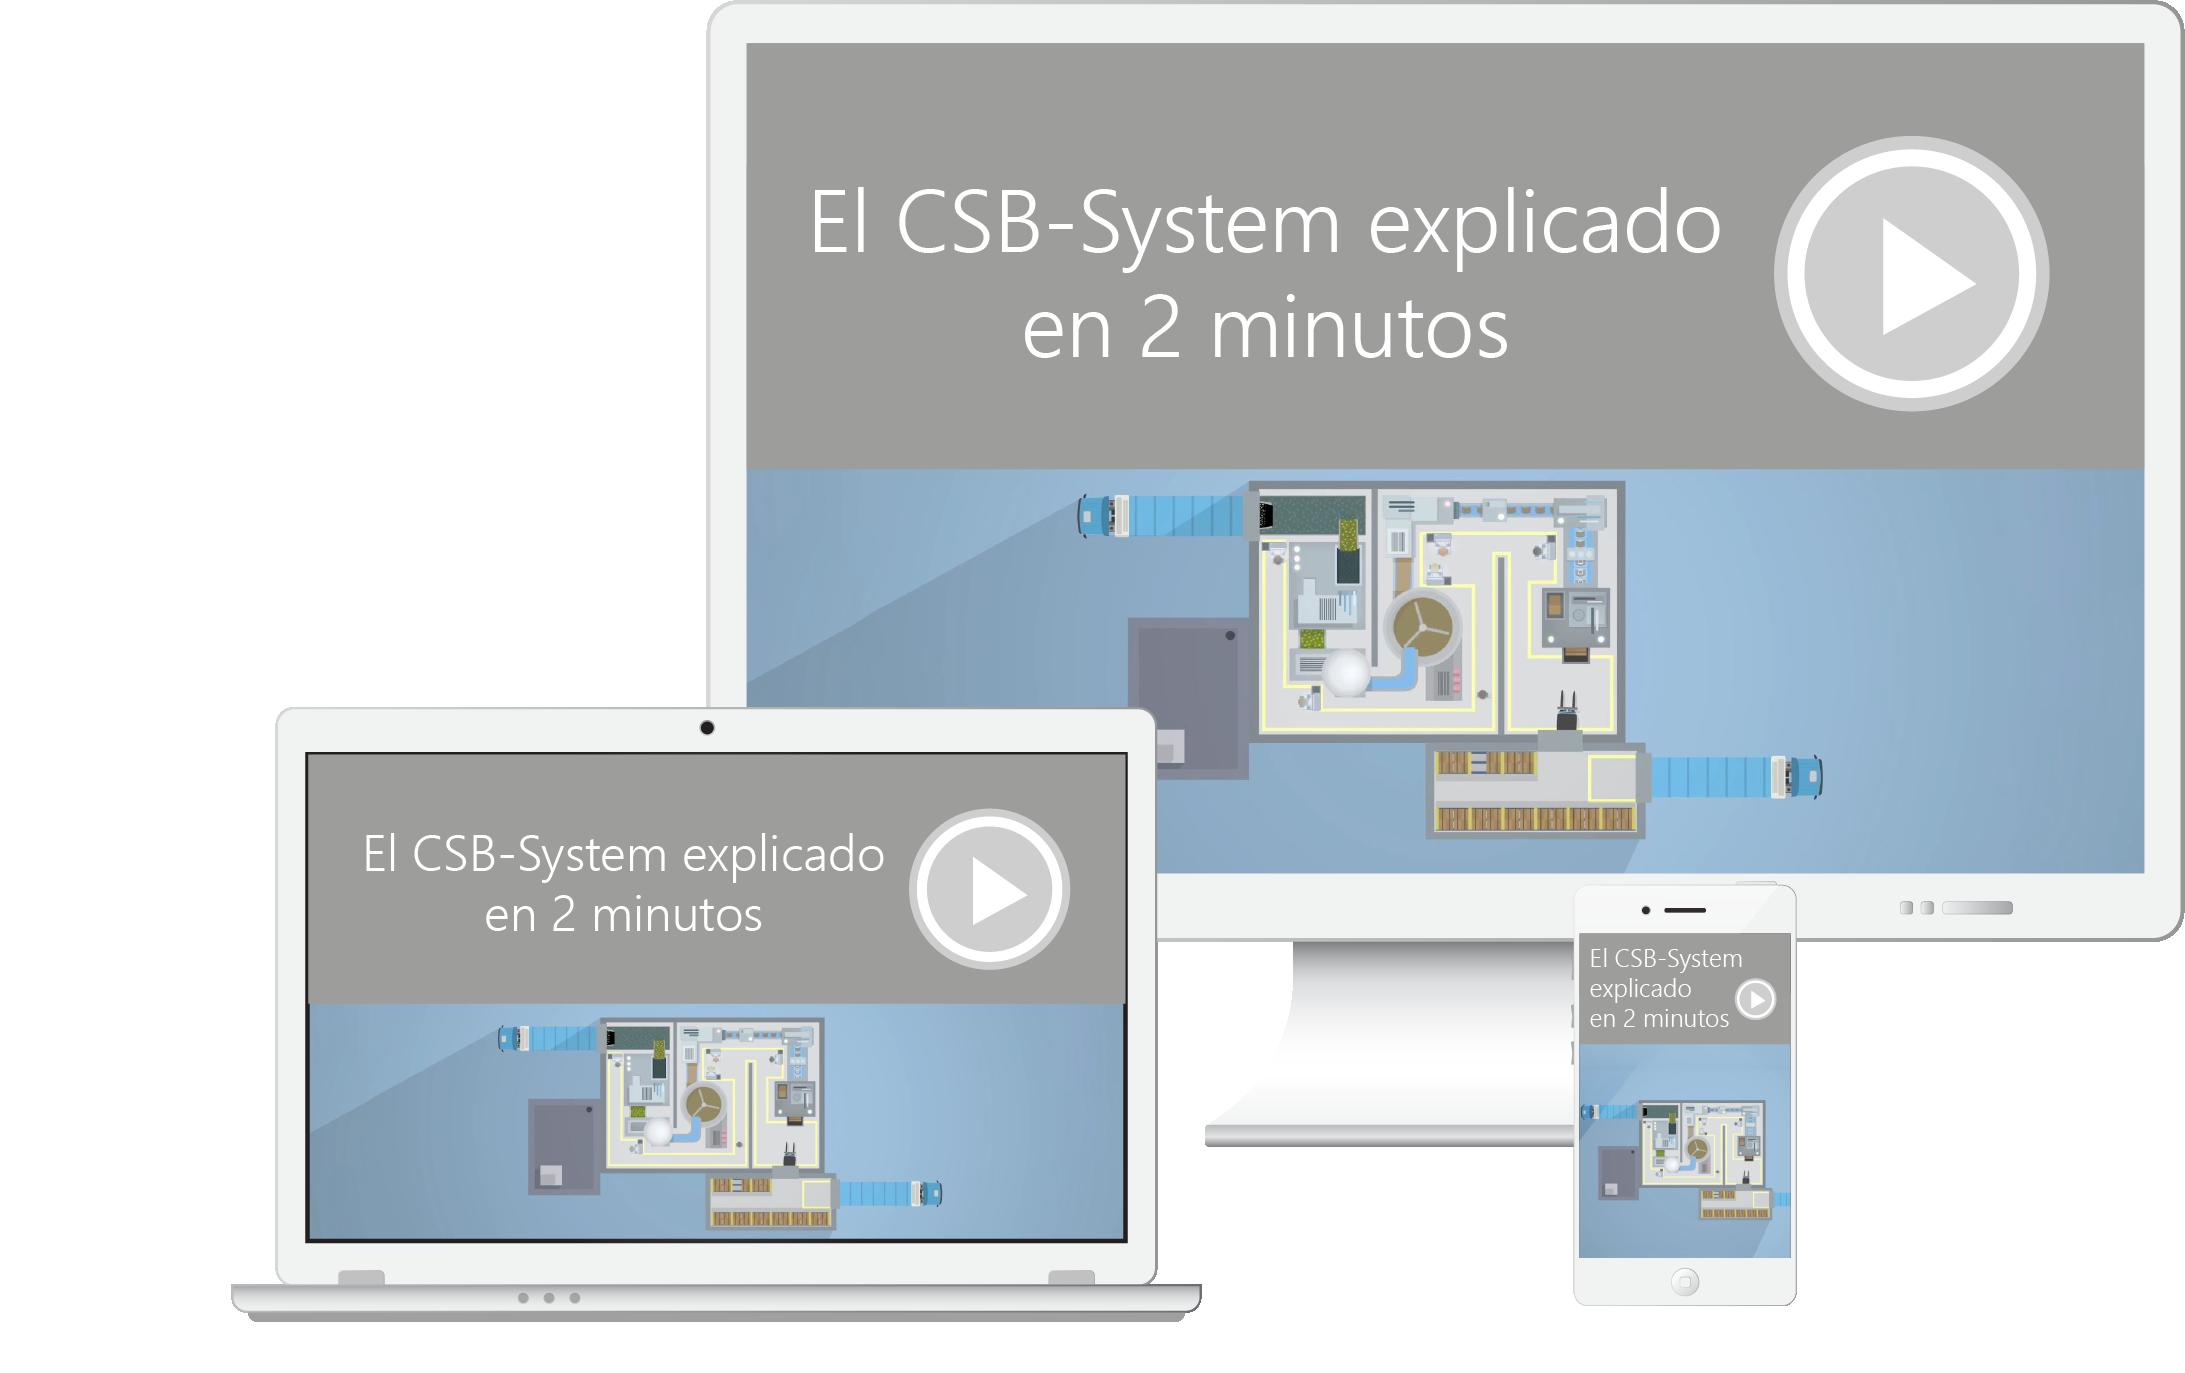 ES_ERP_Landingpage_Softwarelösungen_Video_Monitor-01.png